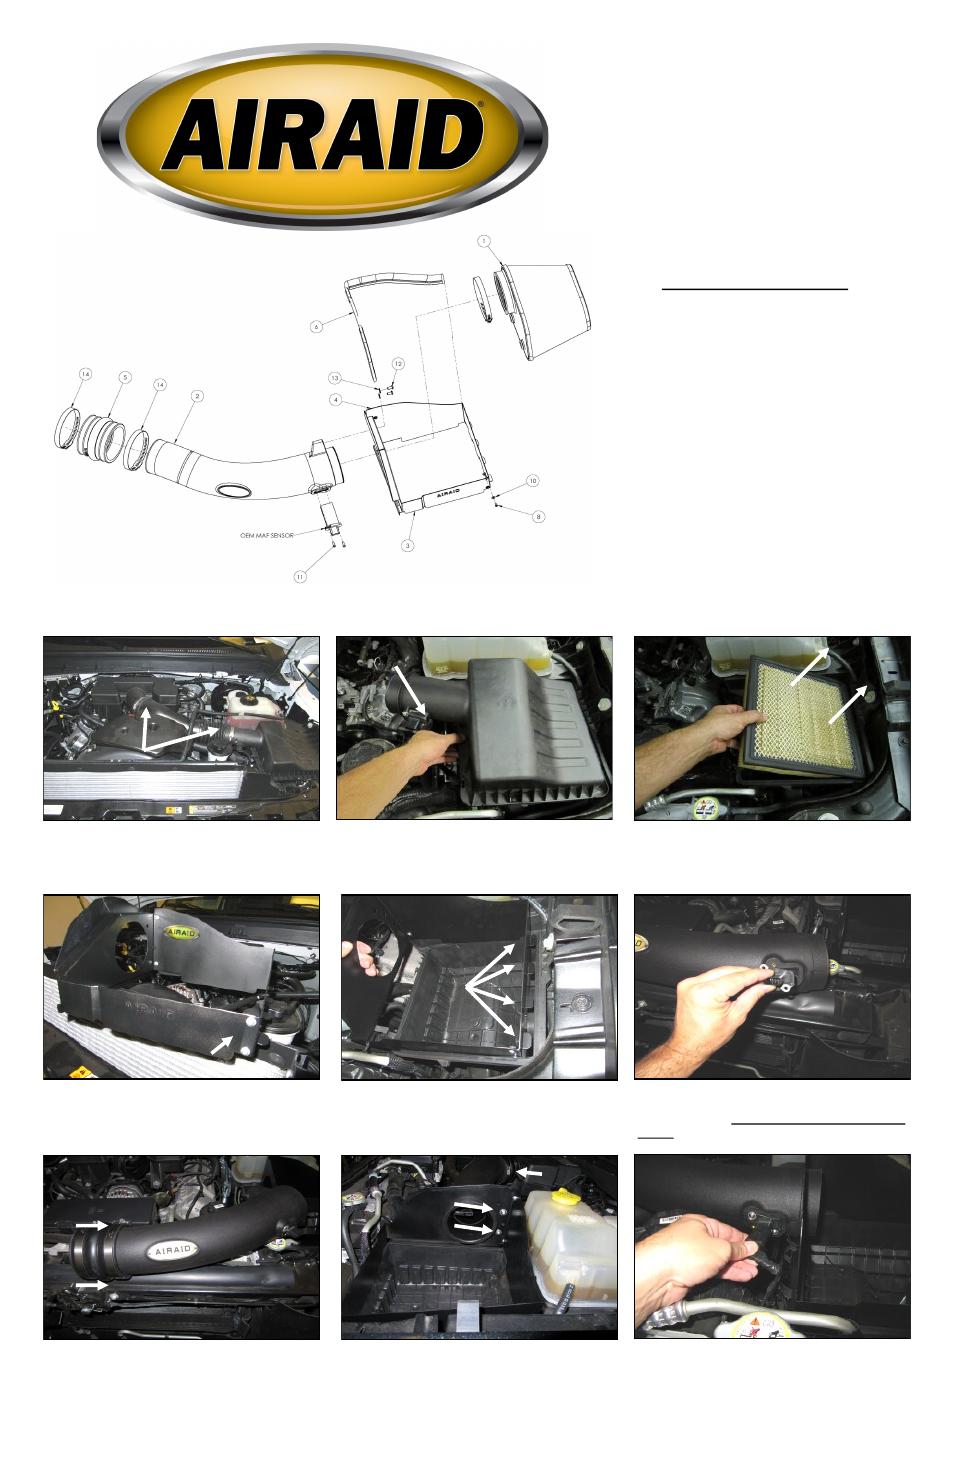 airaid 400 273 user manual 2 pages also for 401 273 402 273 rh manualsdir com Operators Manual Instruction Manual Book